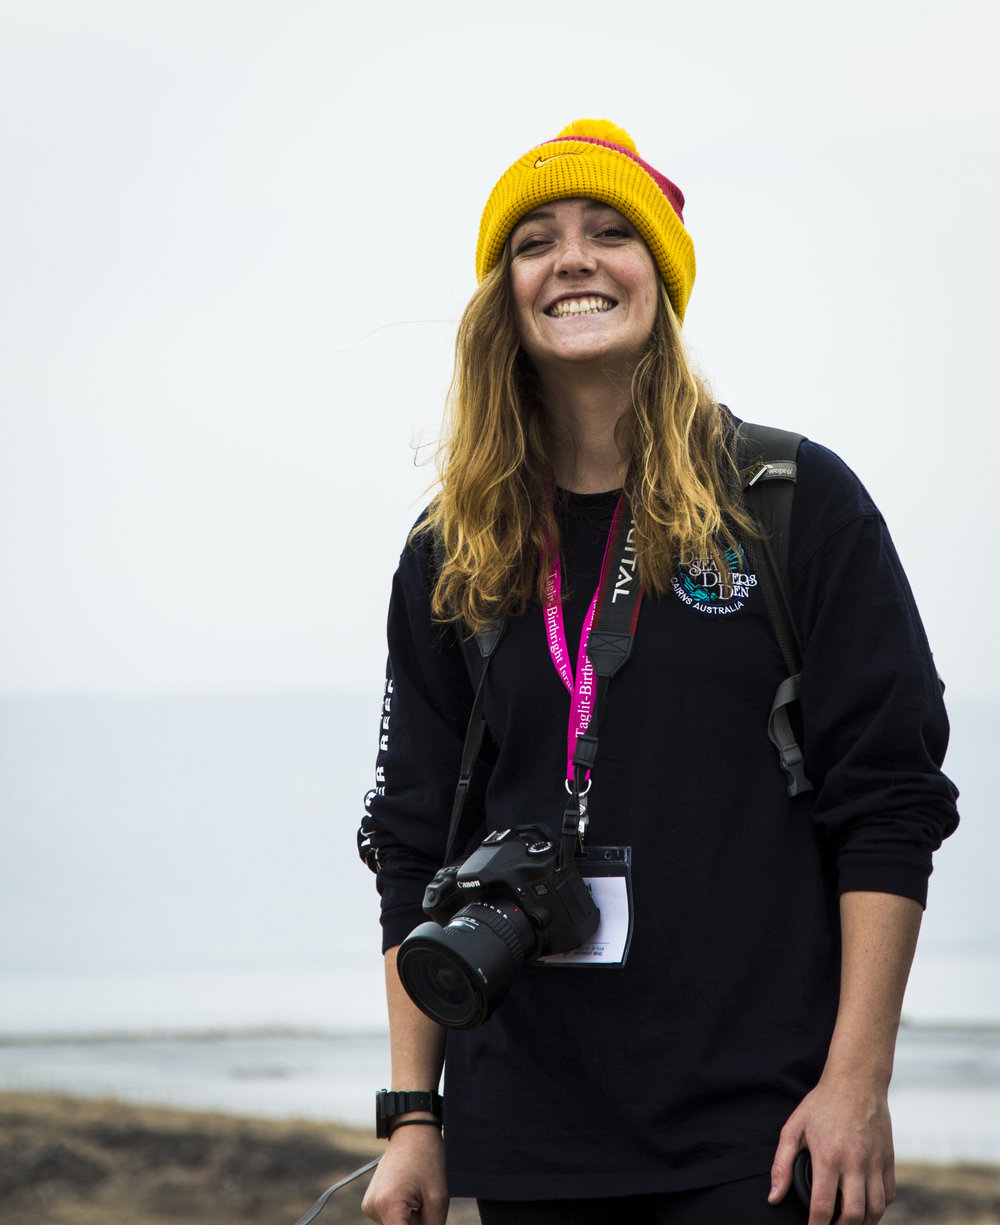 TRIP LEAD: Ailish - If you come hike with me you will 100% get to see me kiss a sea hare.Contact Ailish: ailishul@usc.eduRead Ailish's bio here.Read Ailish's spotlight here.